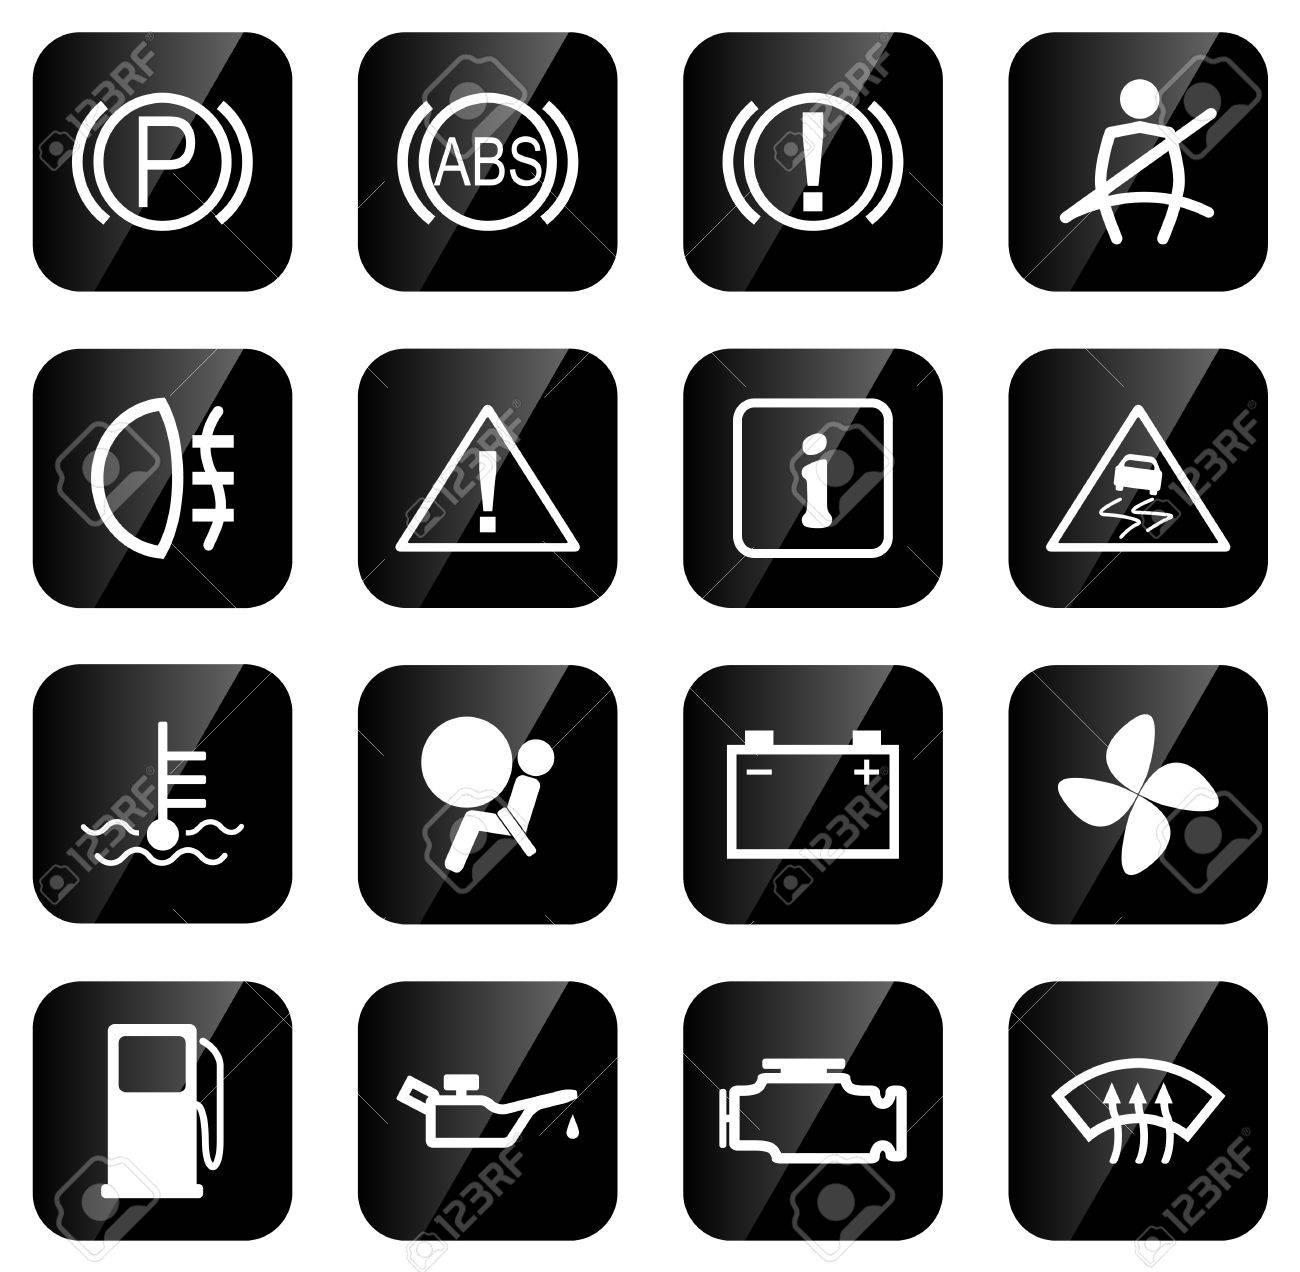 Set Of Icons For Car Dash Vector Illustration Royalty Free - Car image sign of dashboardcar dashboard icons stock images royaltyfree imagesvectors